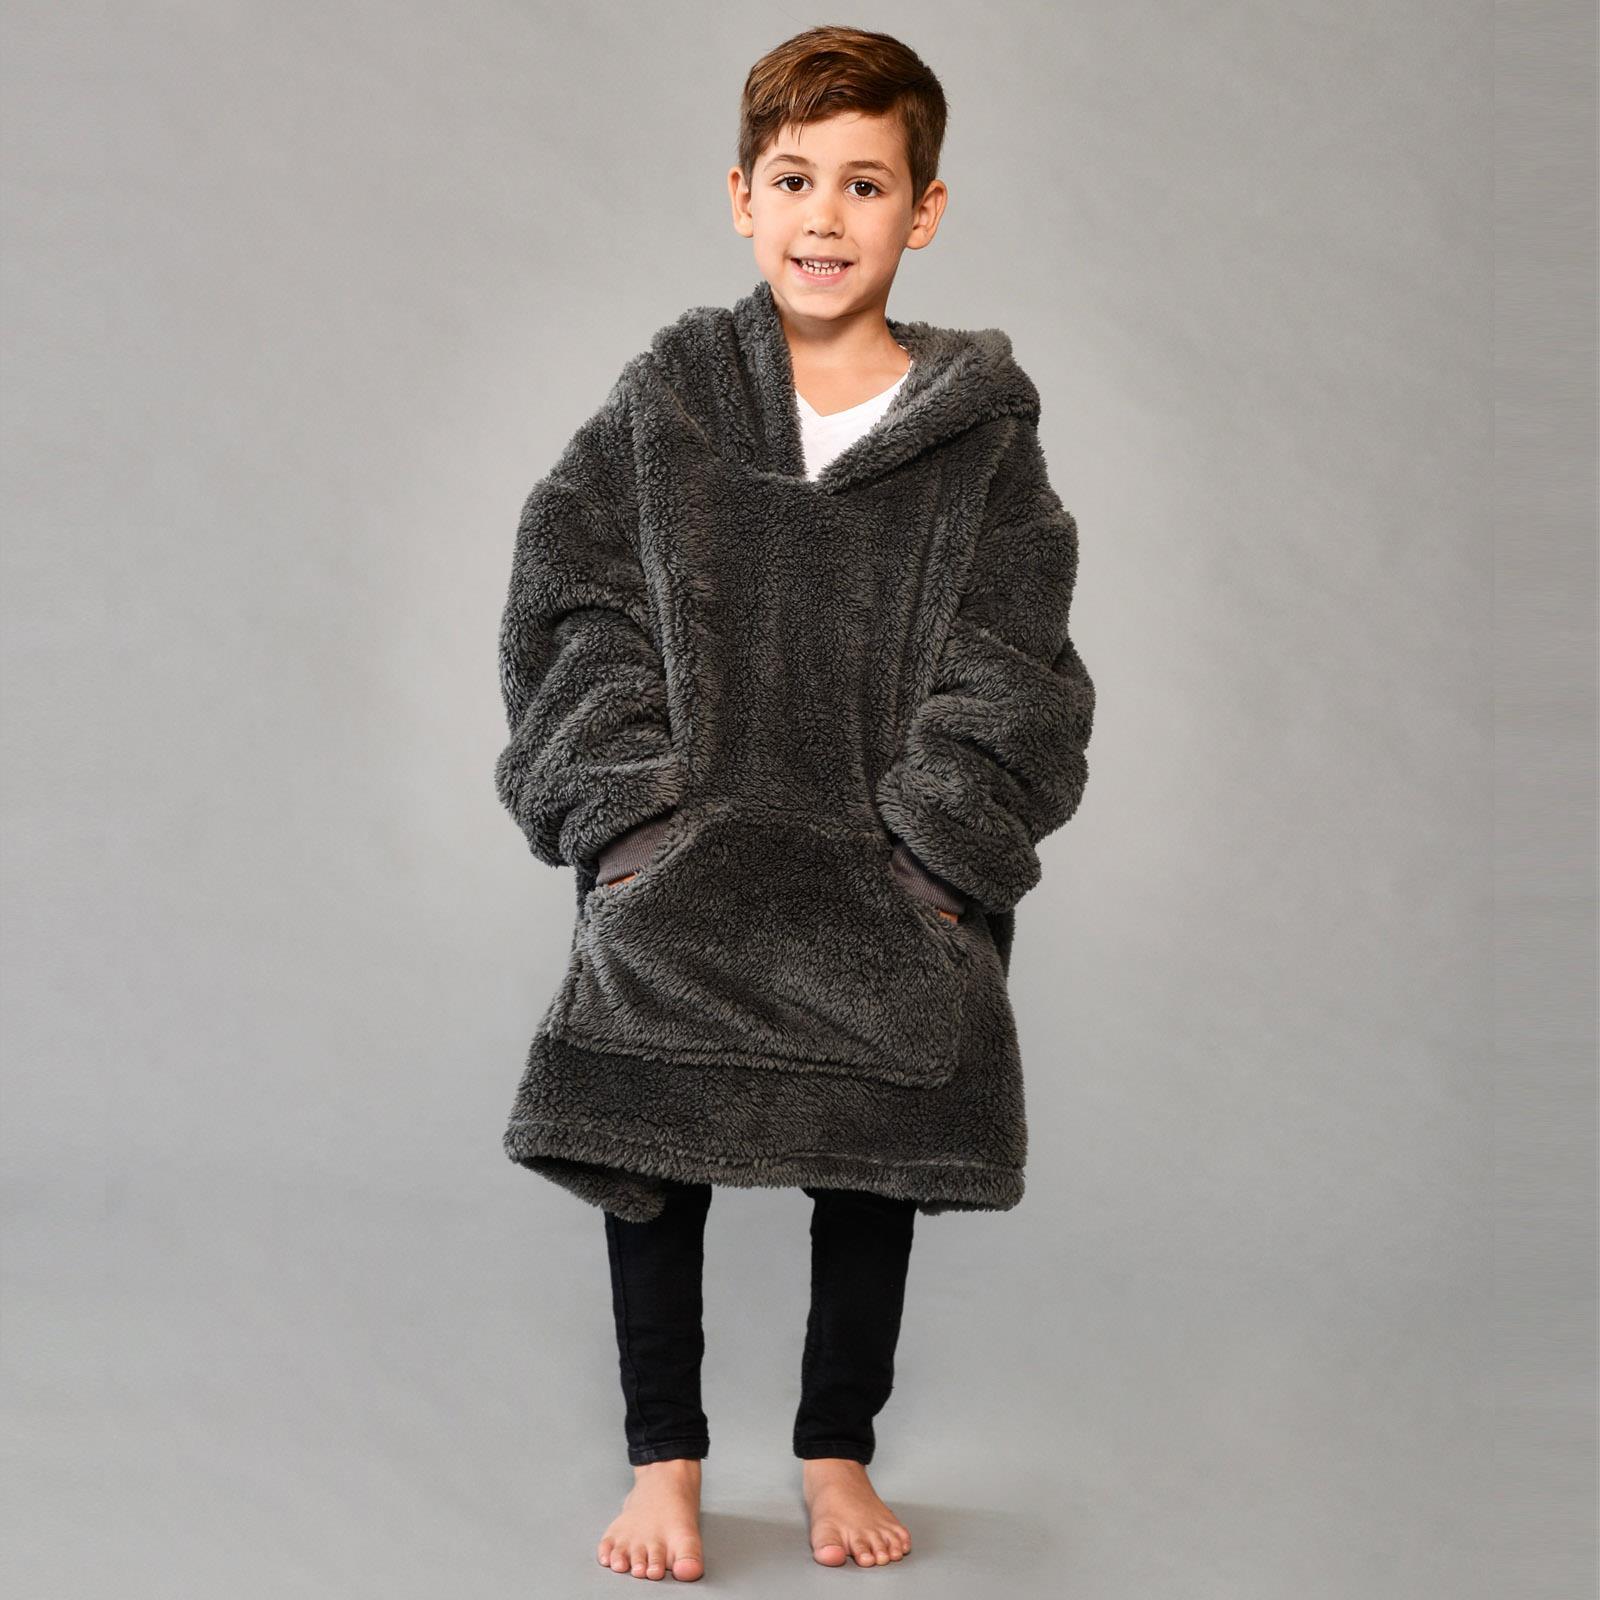 thumbnail 17 - Brentfords-Teddy-Fleece-Hoodie-Blanket-Oversized-Giant-Wearable-Adults-Kids-UK